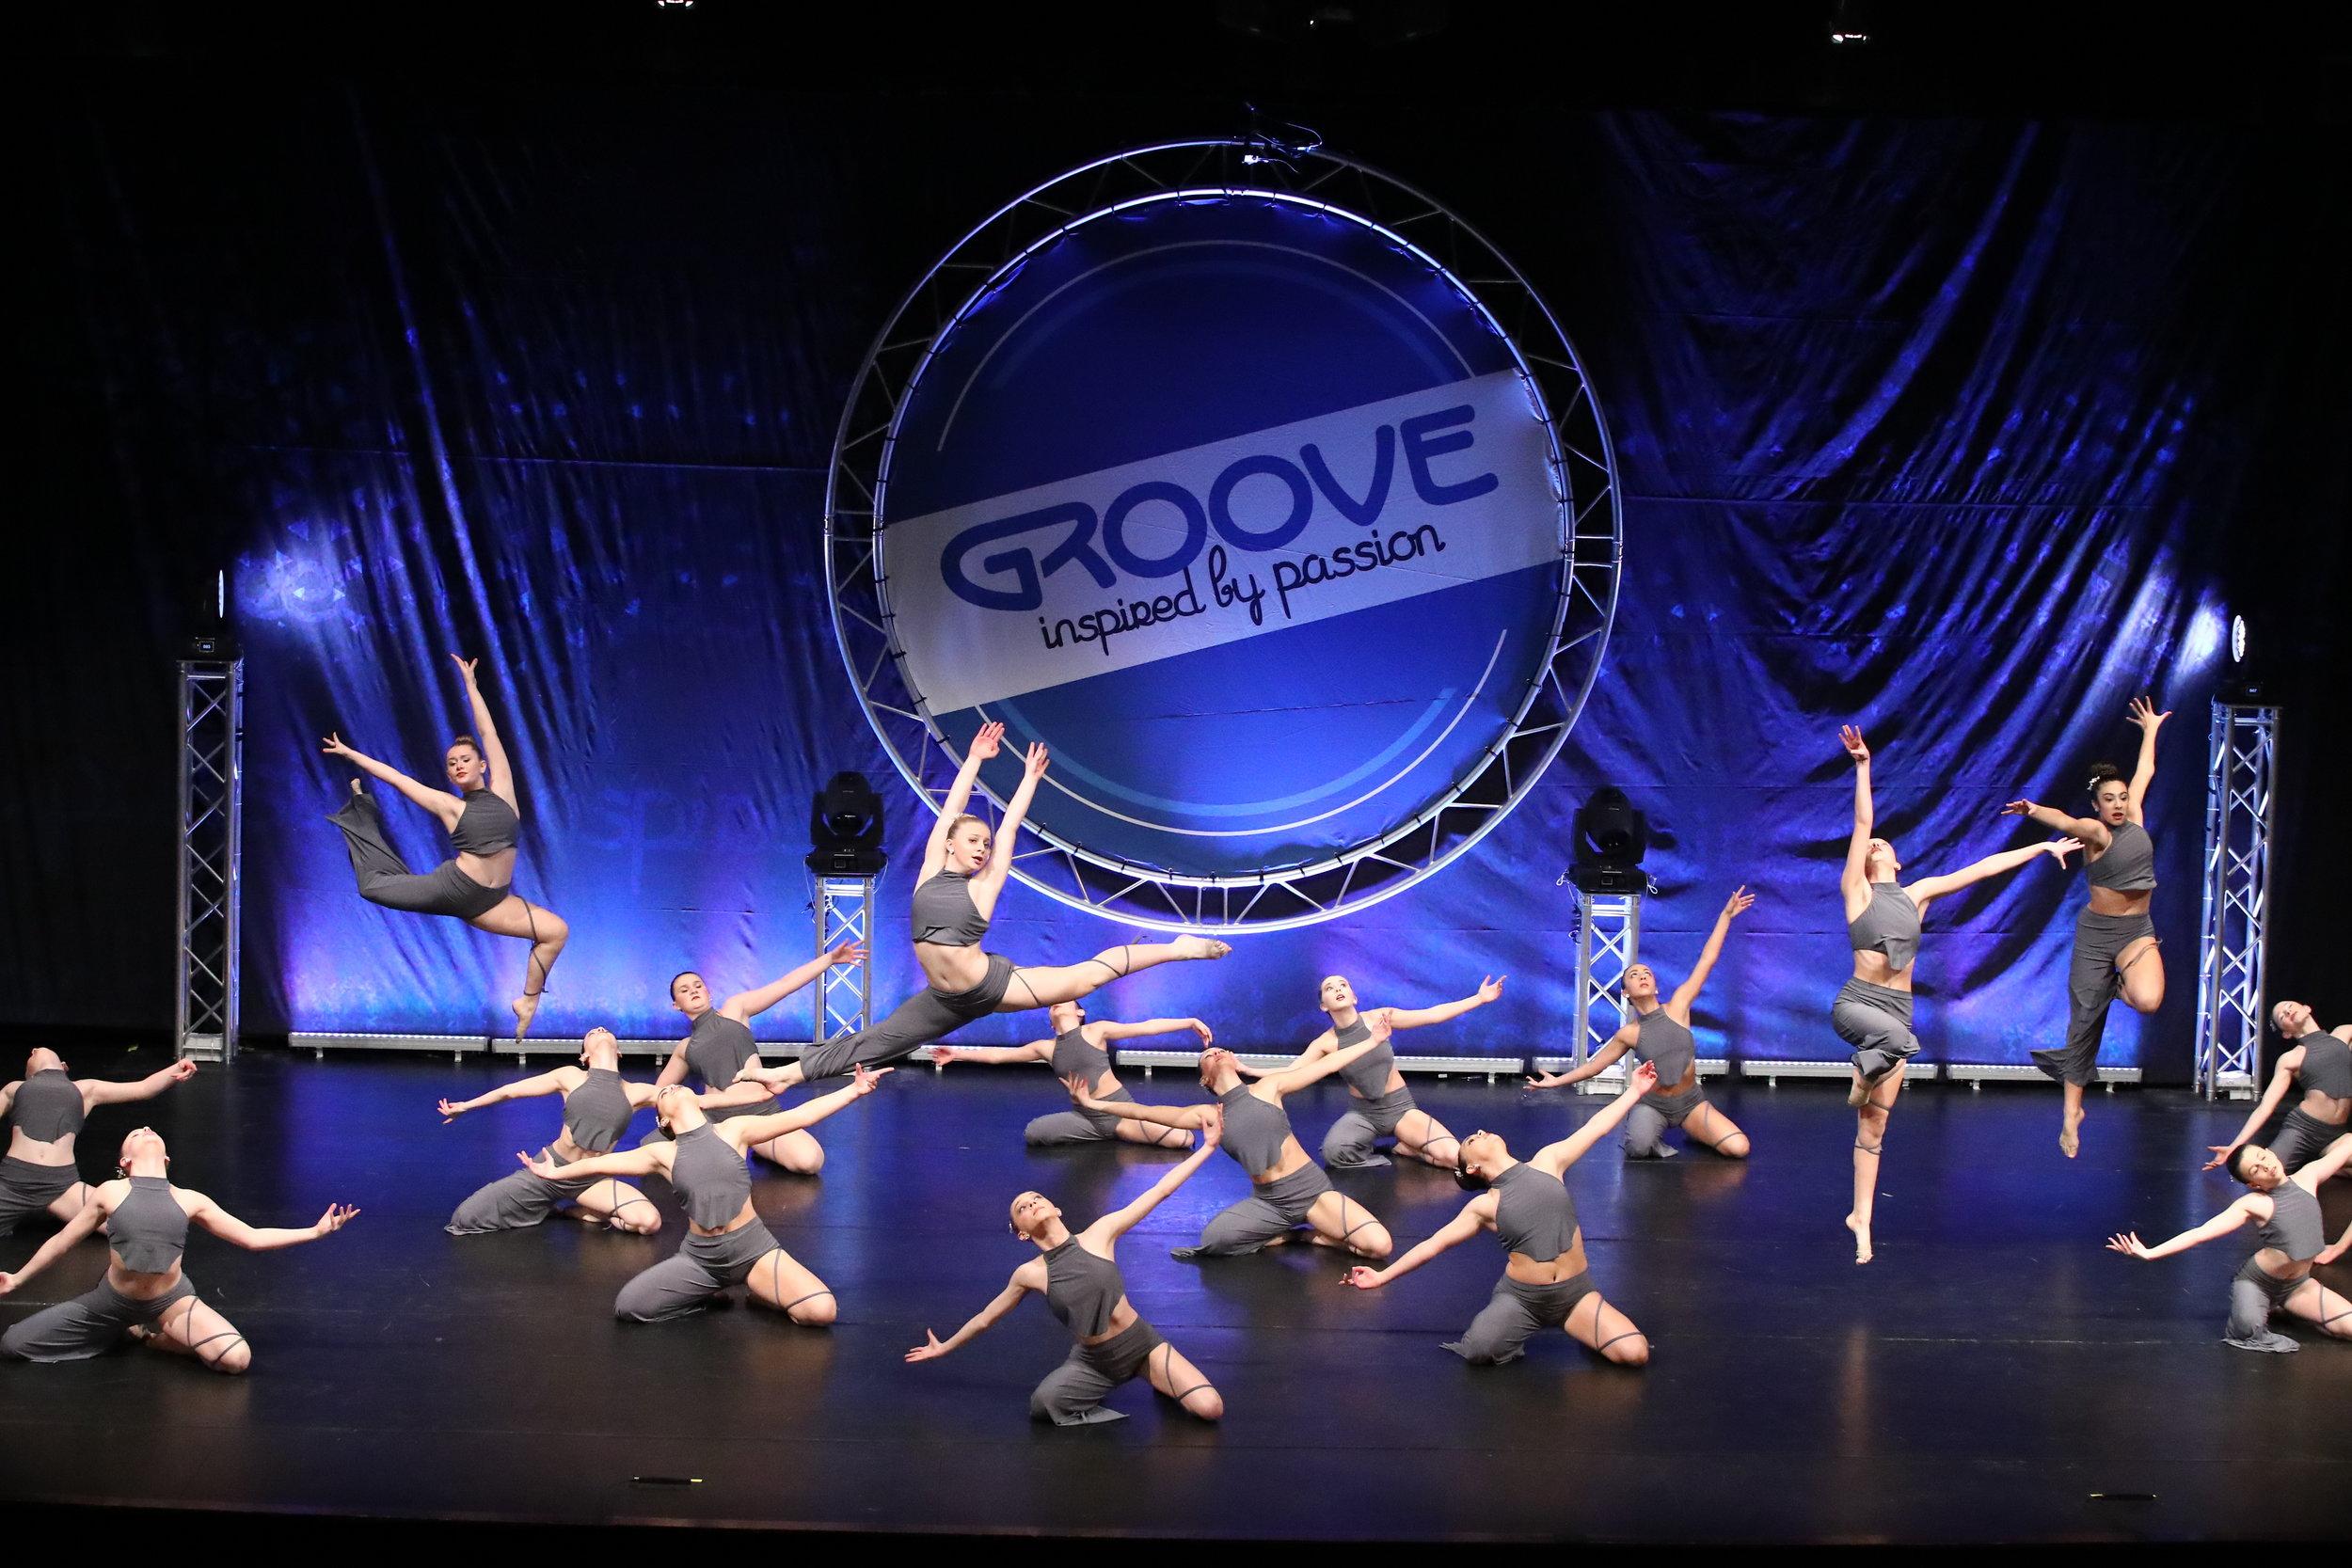 Groove 8.JPG